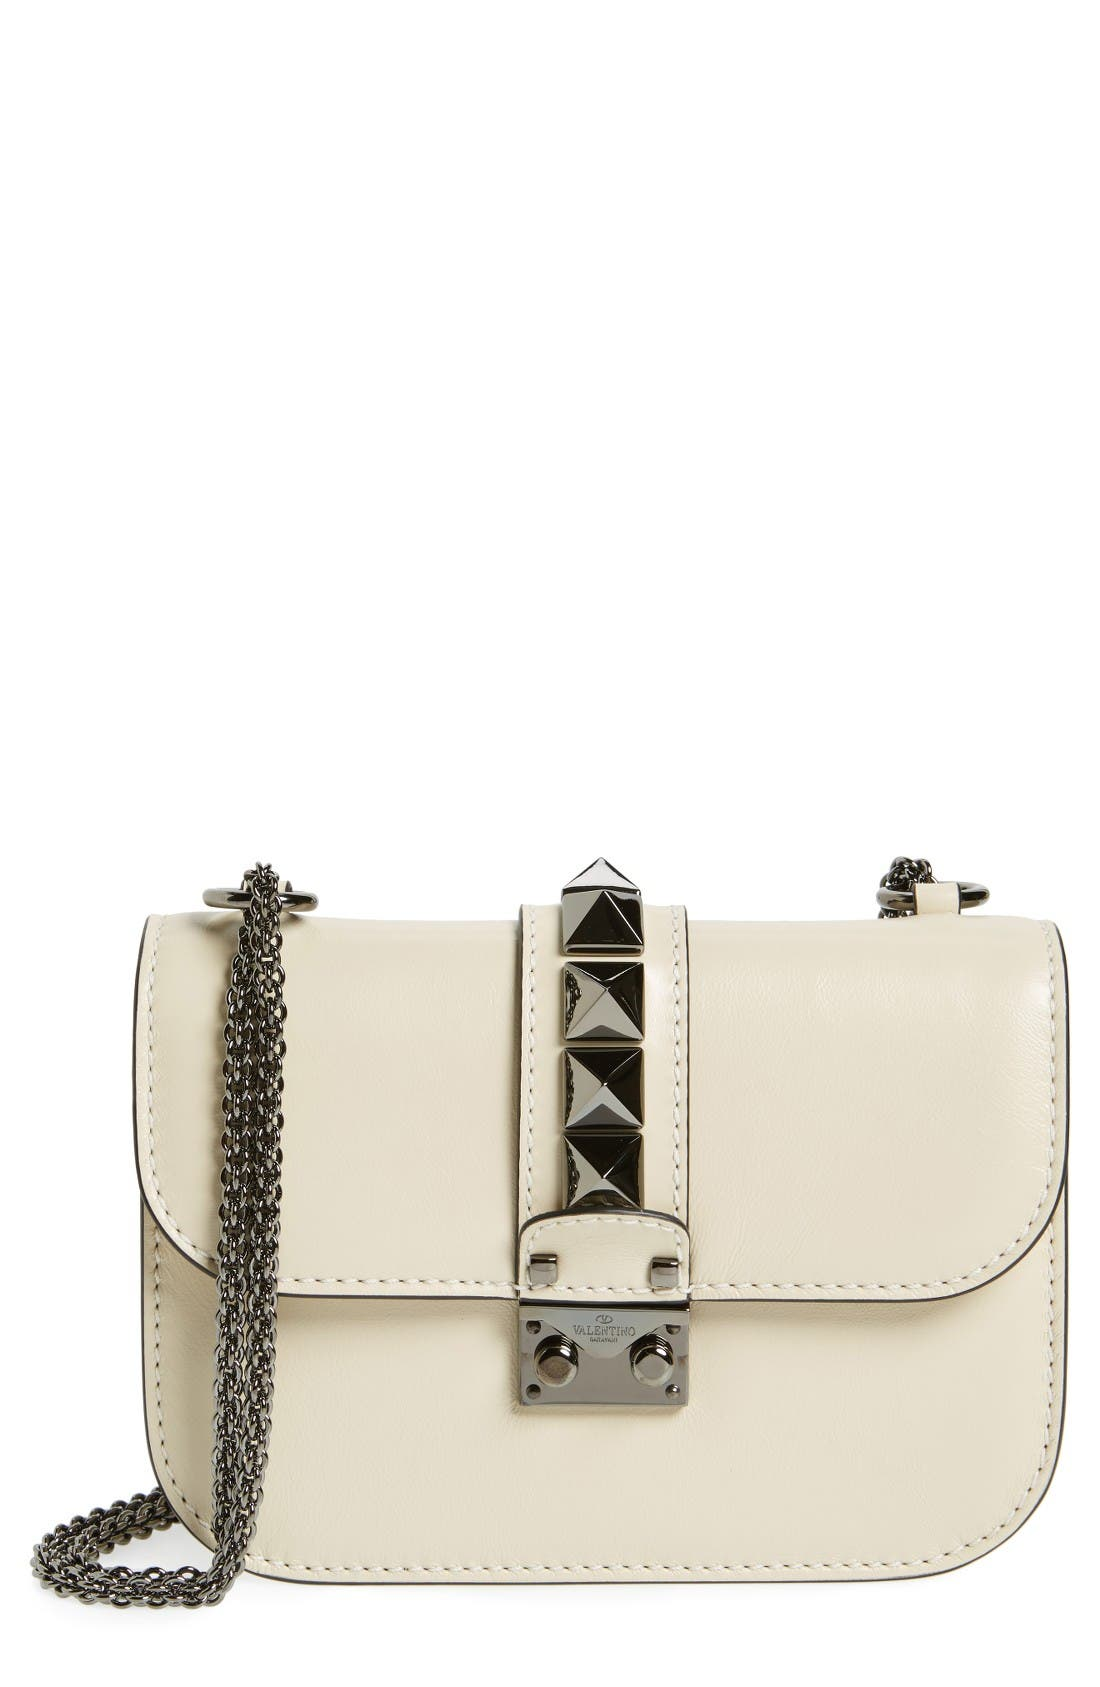 VALENTINO GARAVANI Small Rockstud Leather Shoulder Bag